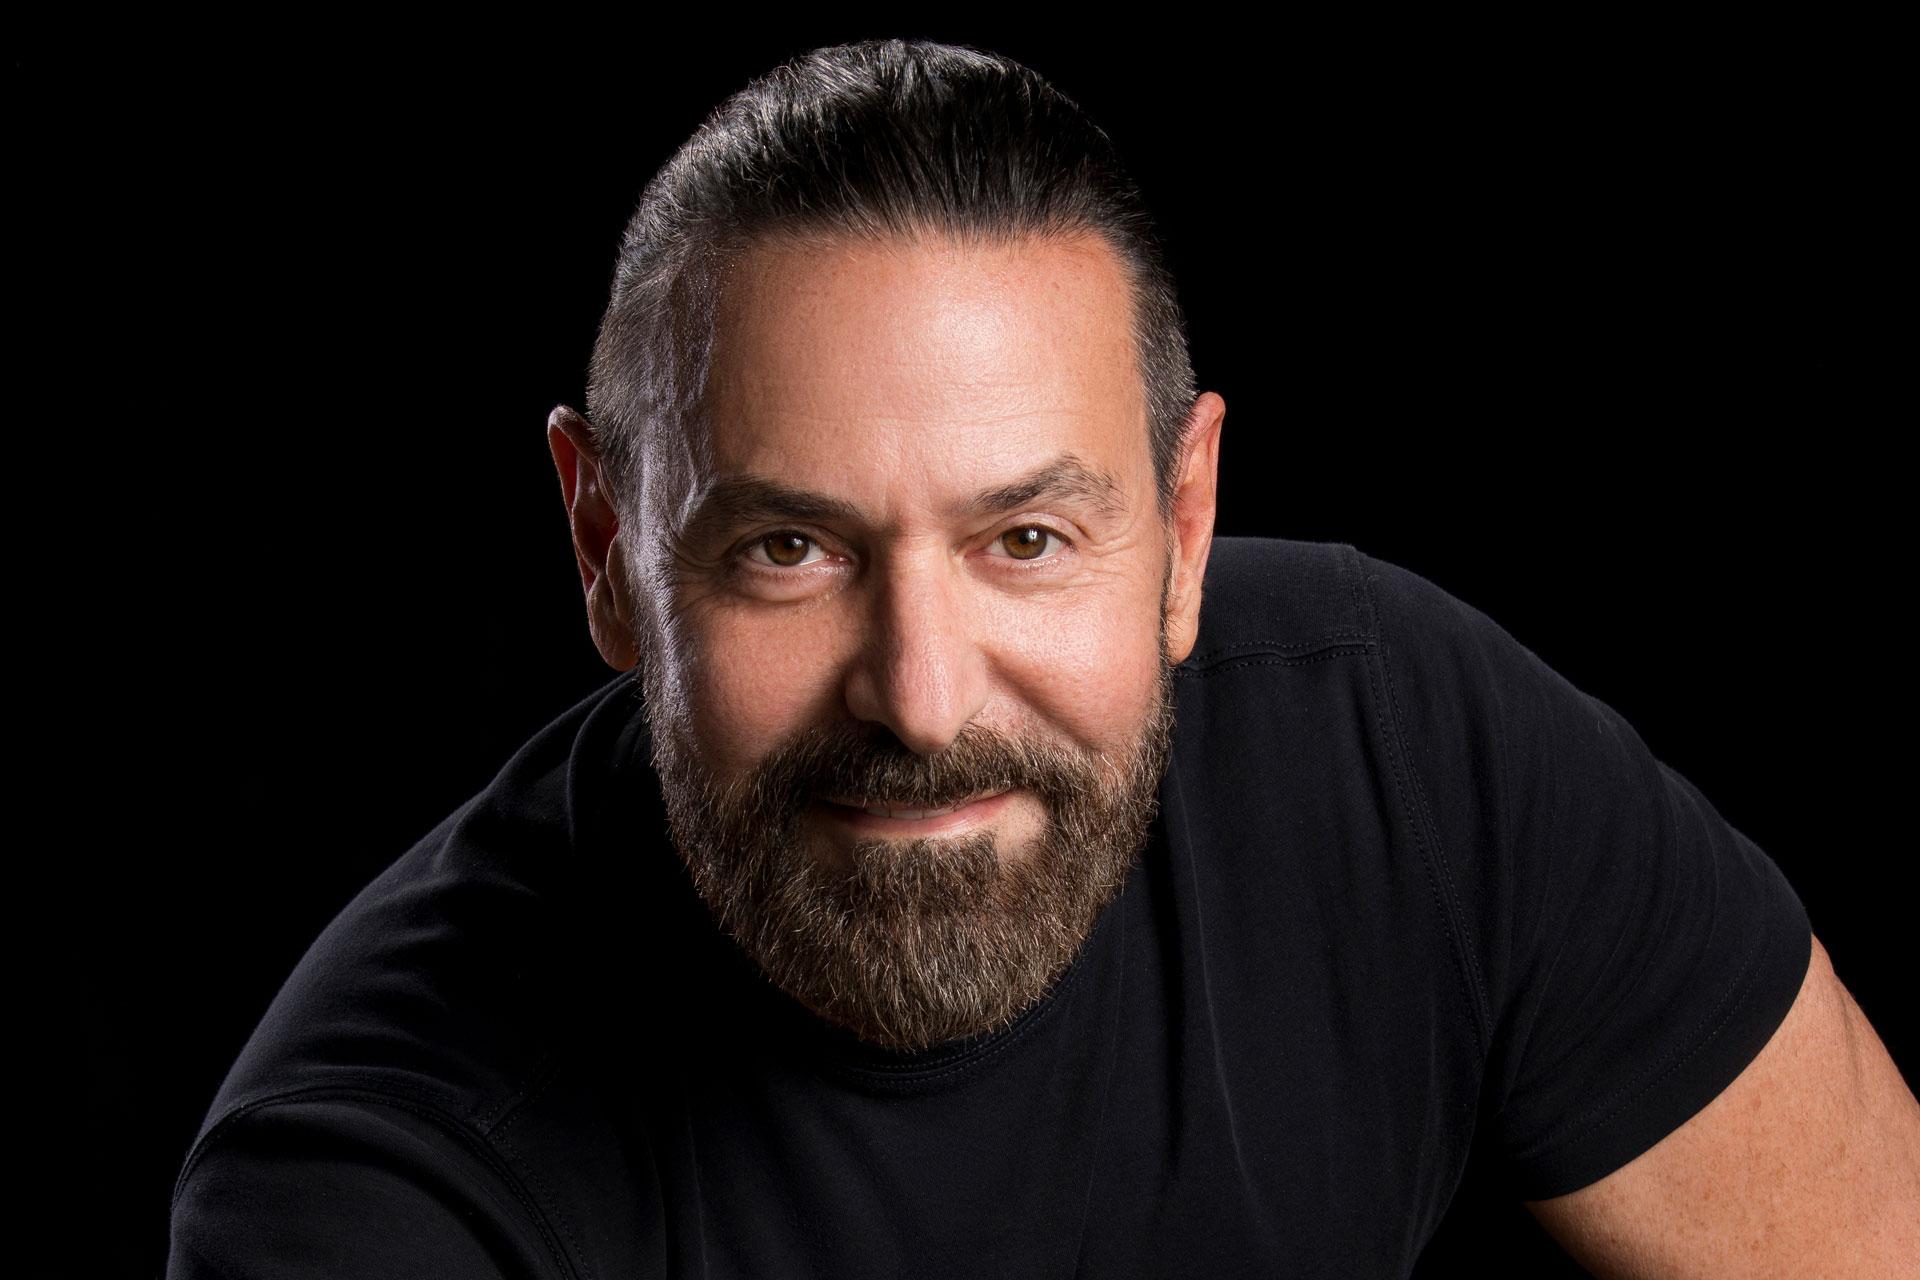 Pepe Calderin, CEO & President of Pepe Calderin Design, United States